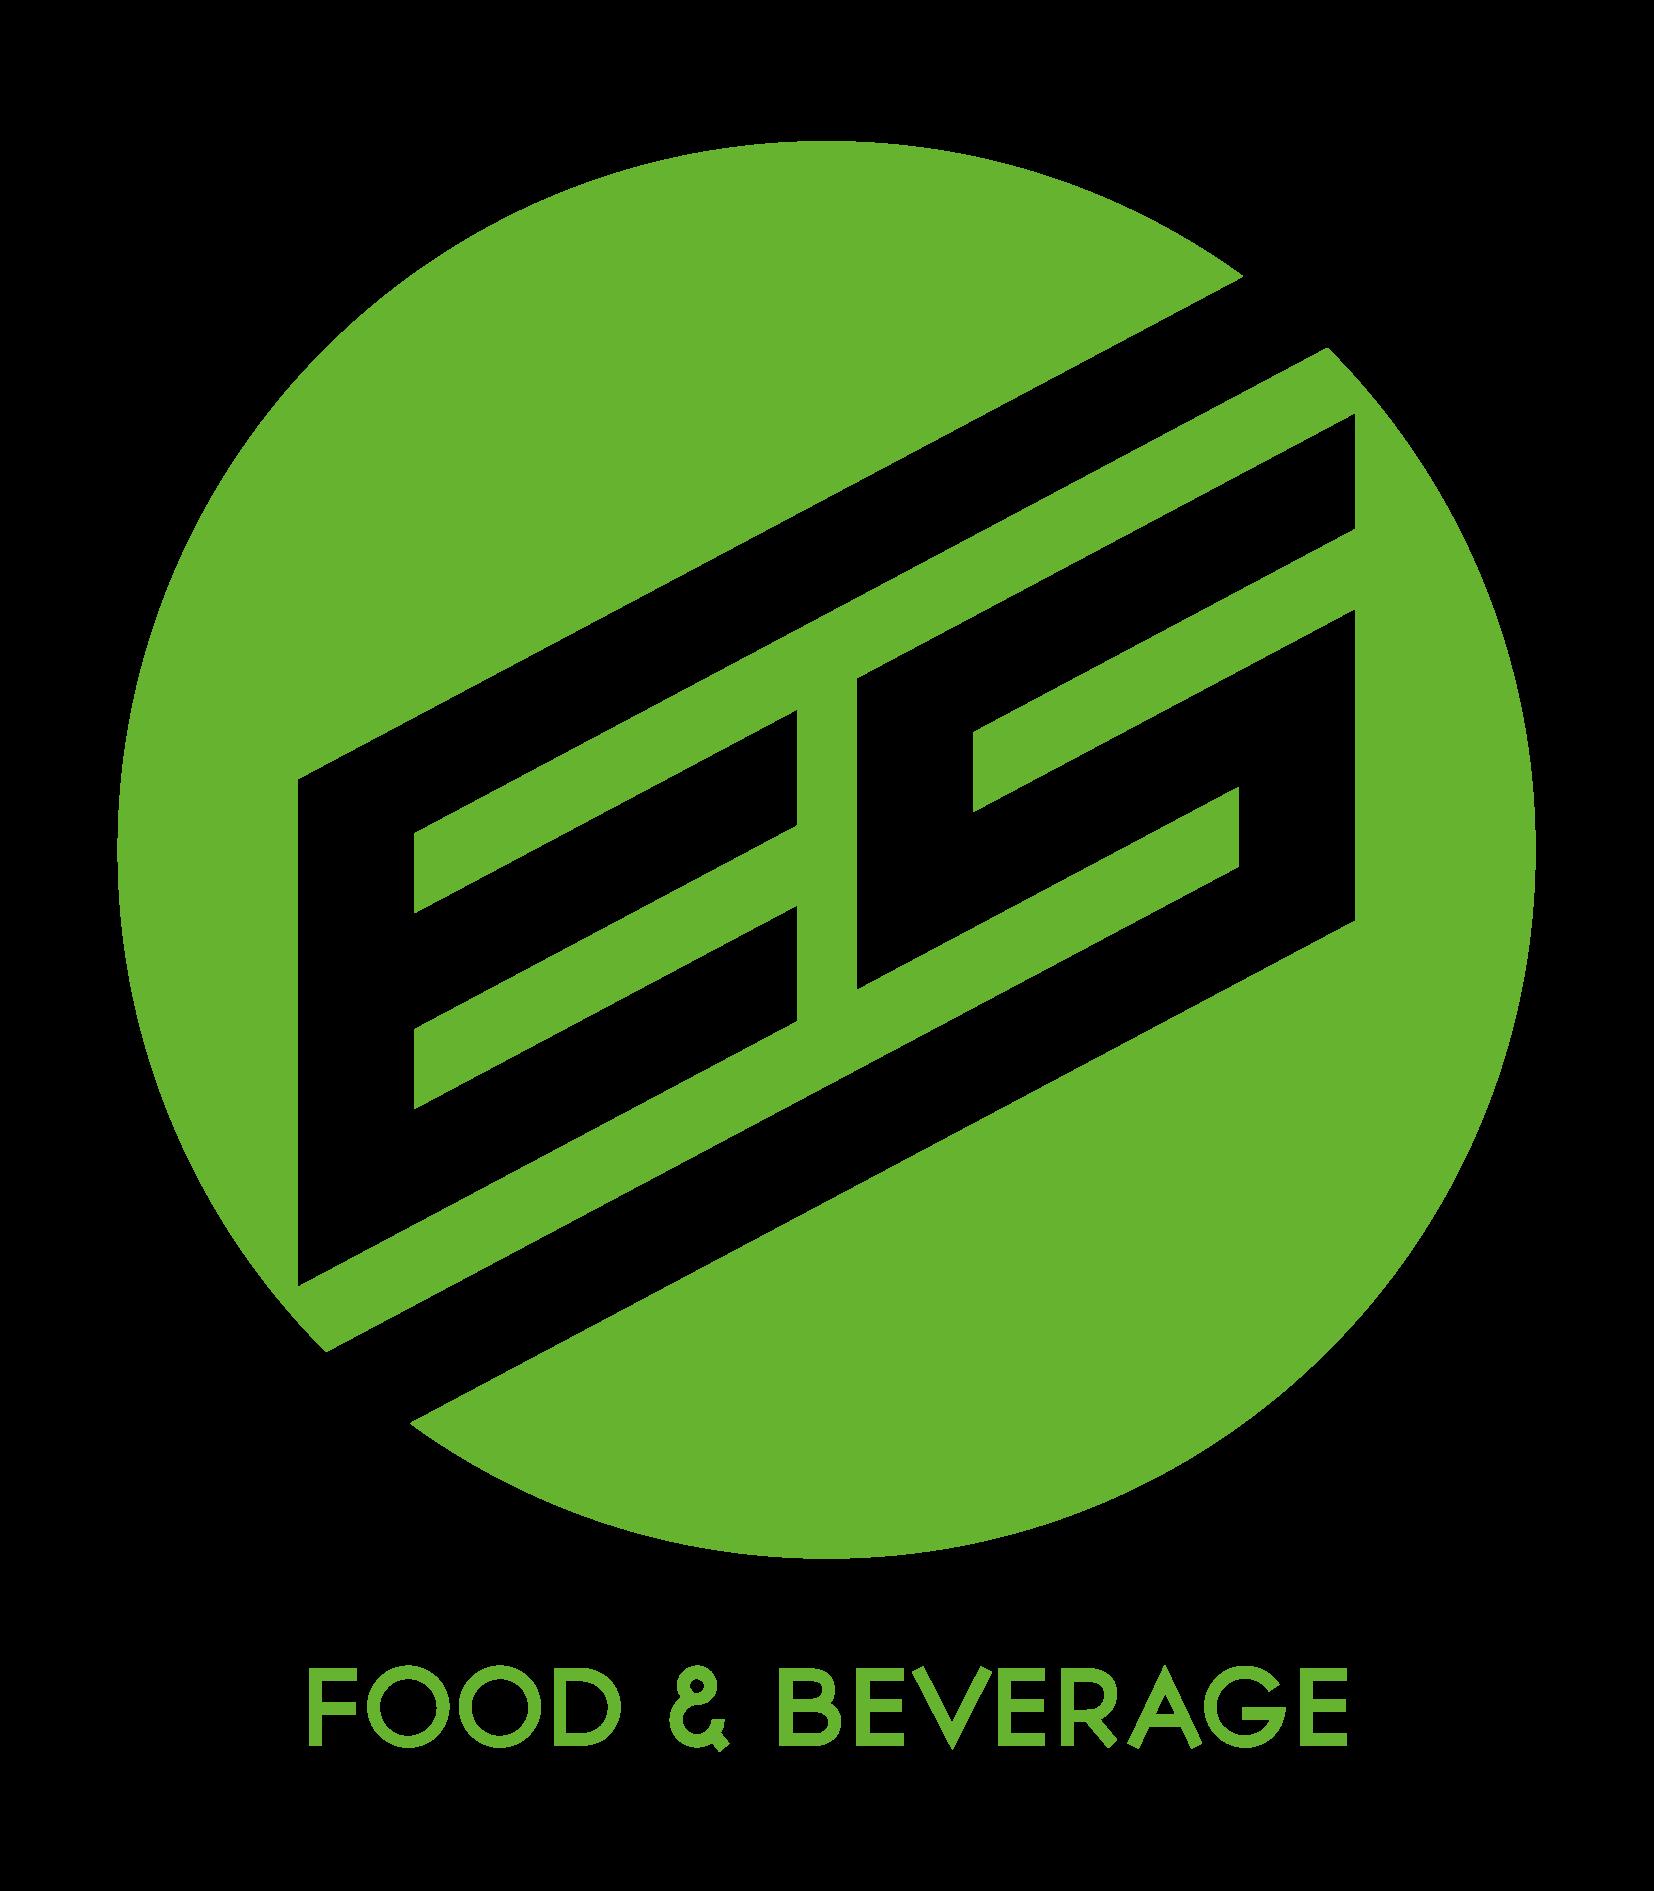 FKP Eventservice GmbH   Food & Beverage